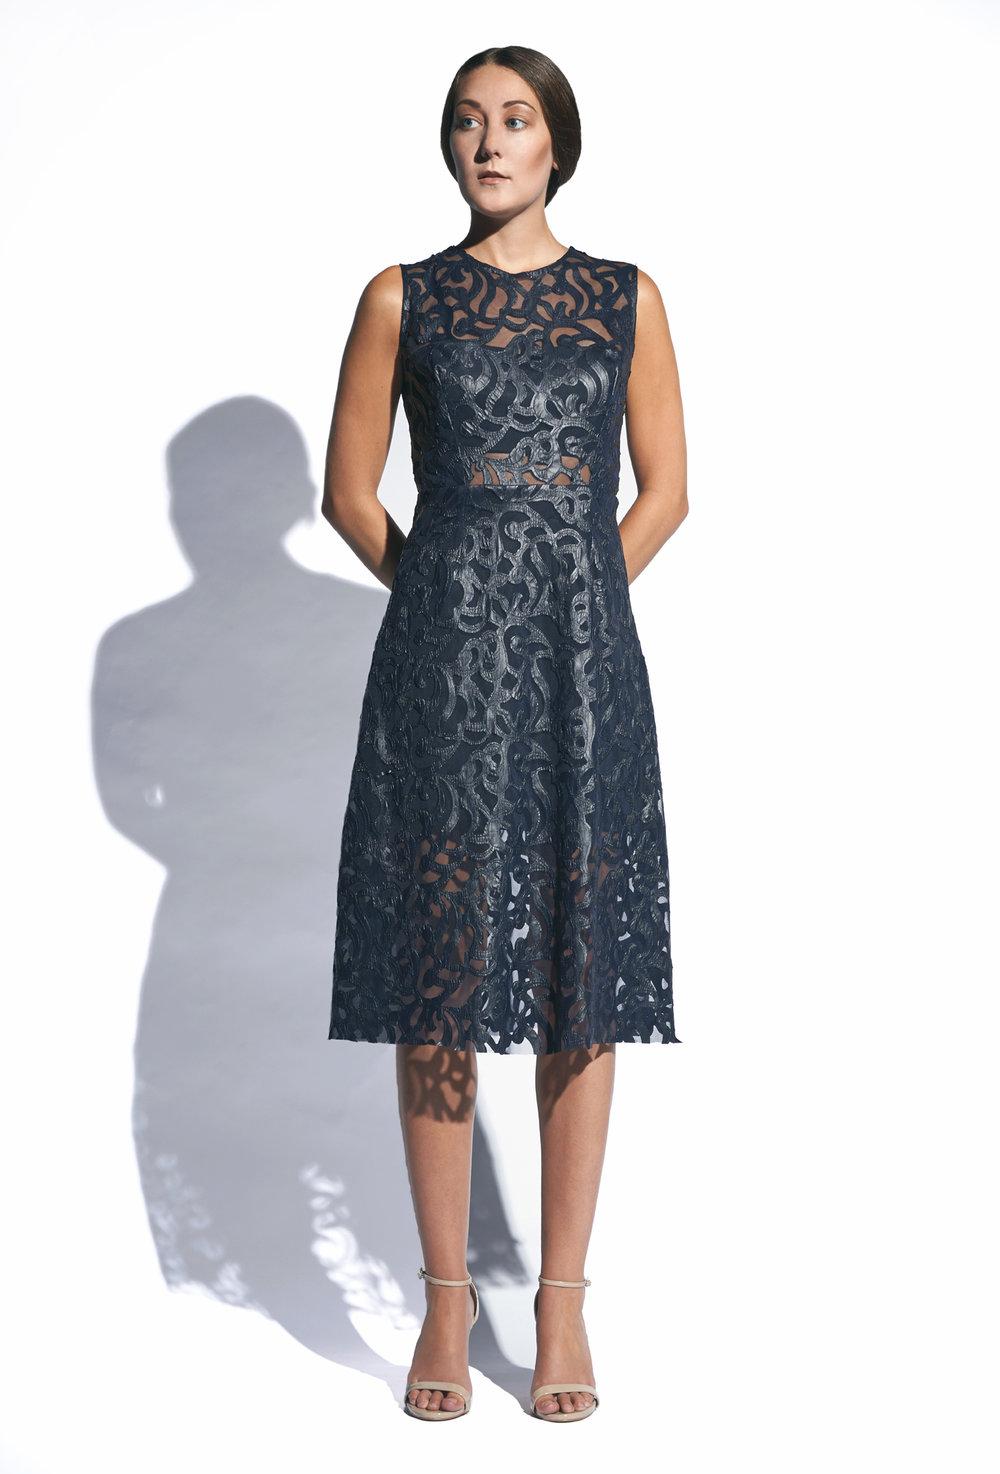 Sycamore Dress